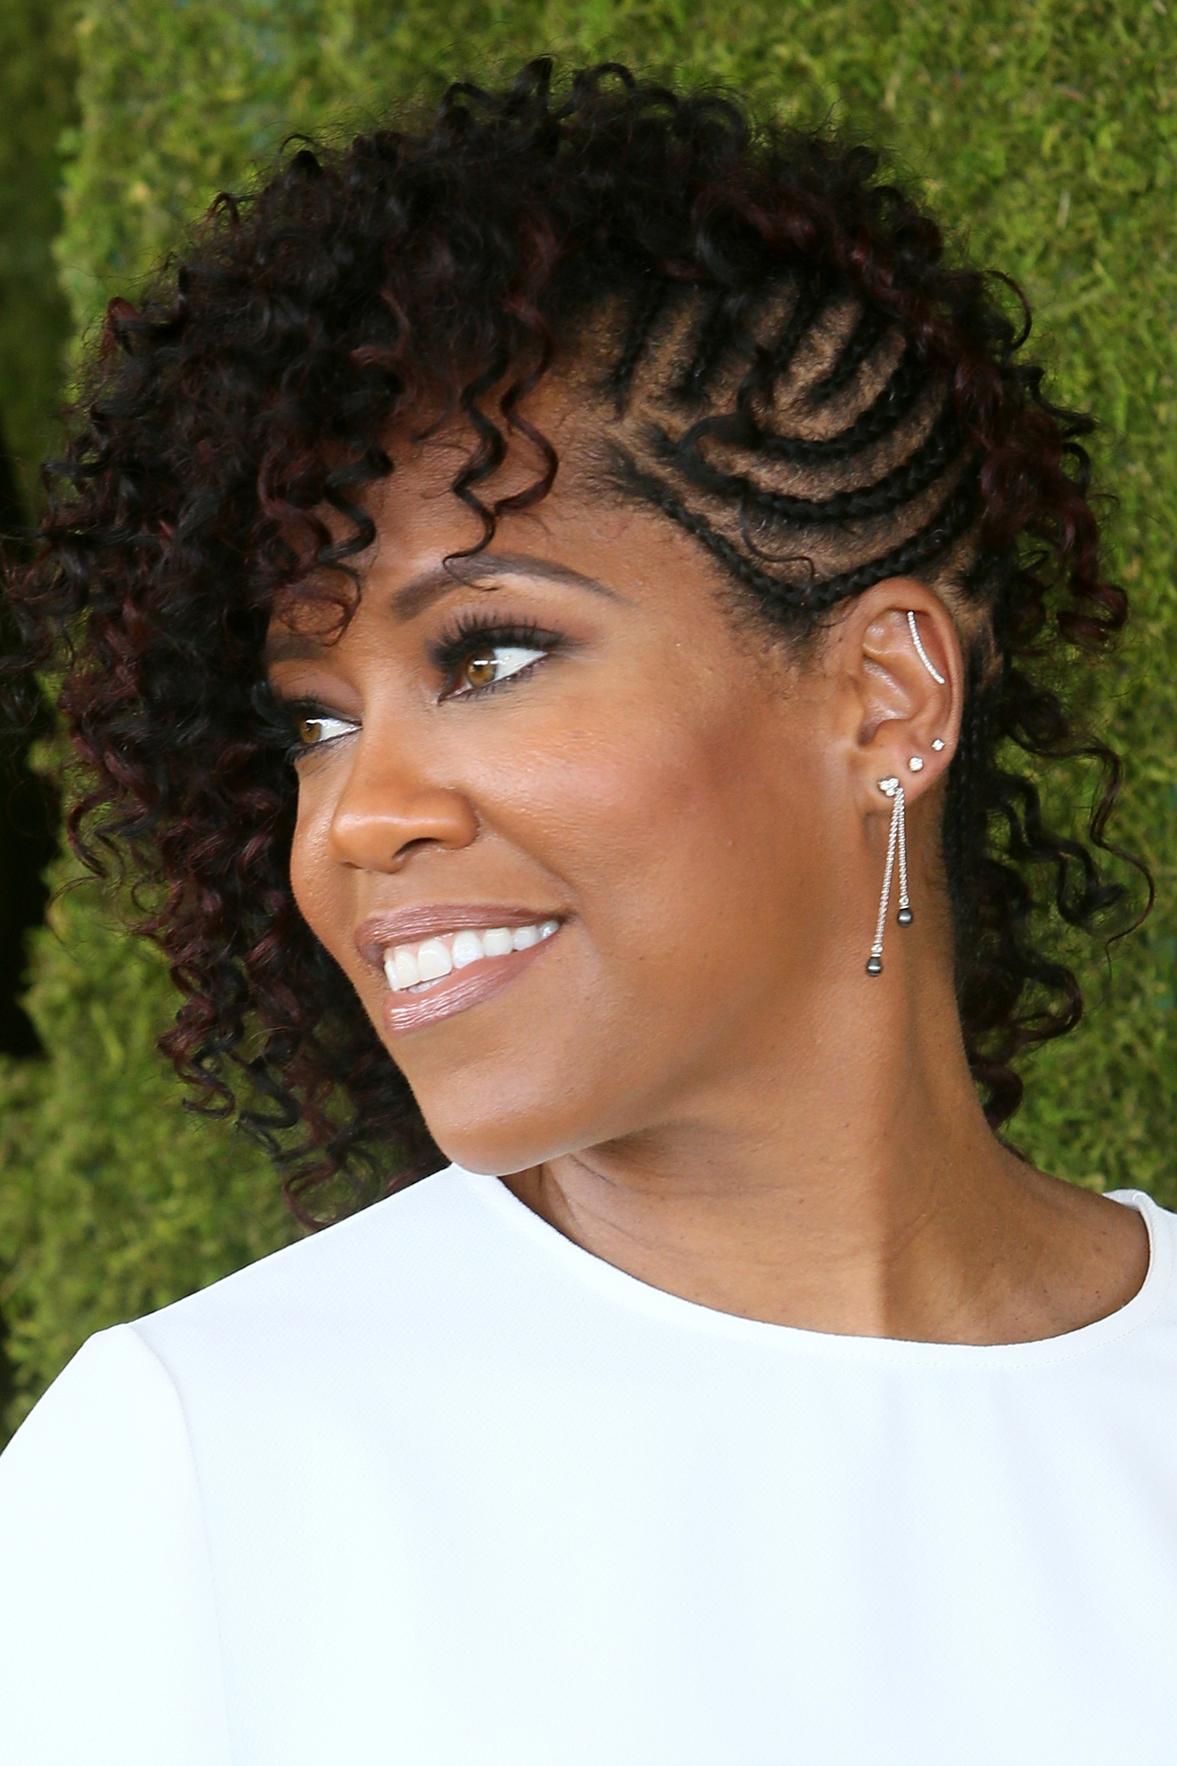 50+ Best Short Hairstyles for Black Women 2017 - Black ...